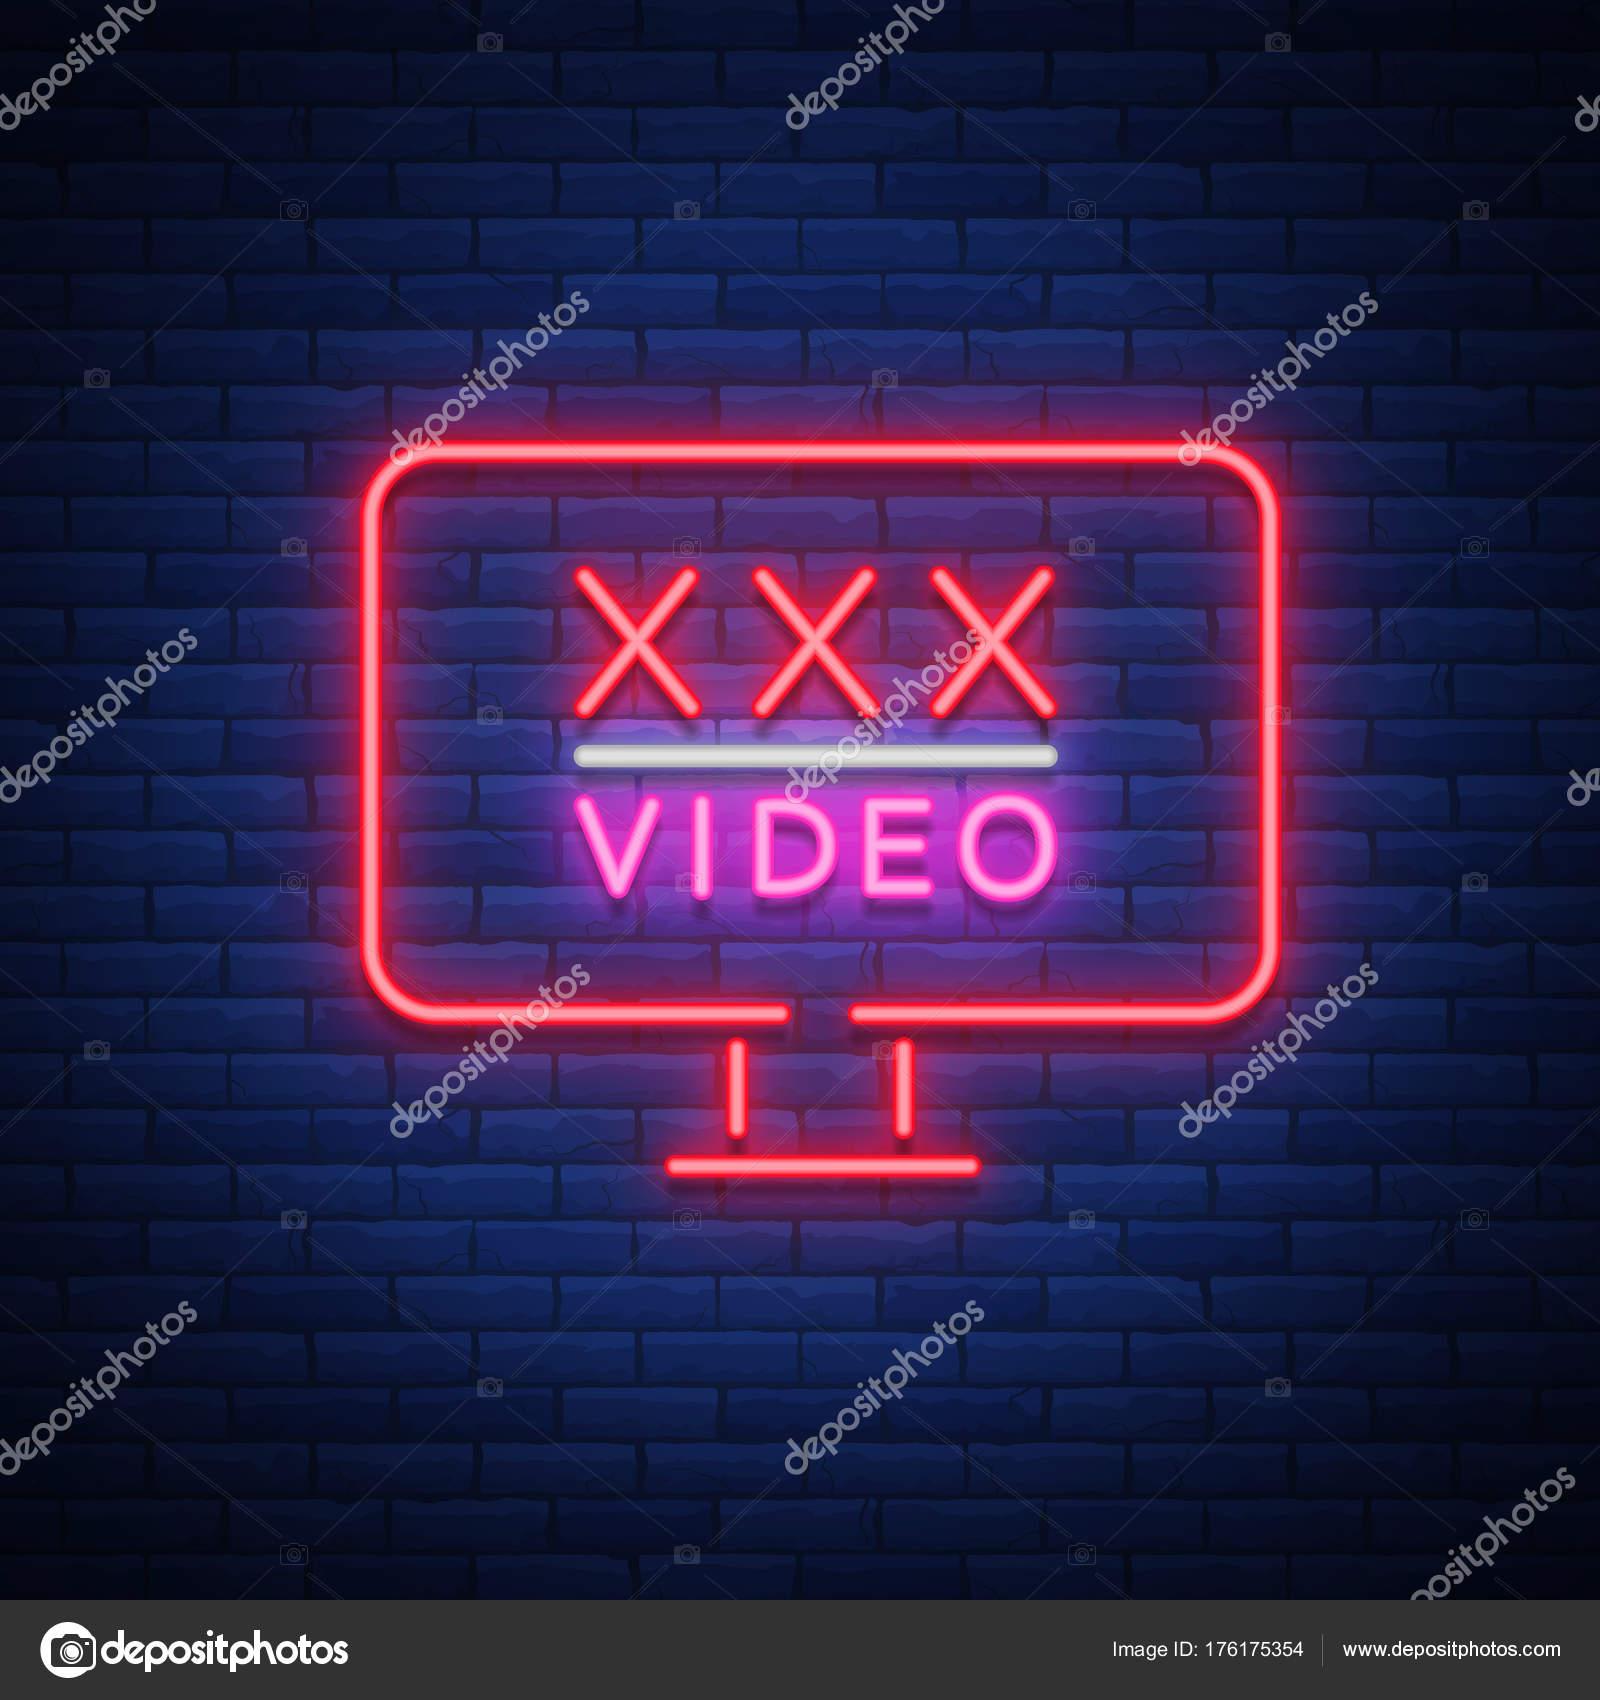 XXX δωρεάν έξι